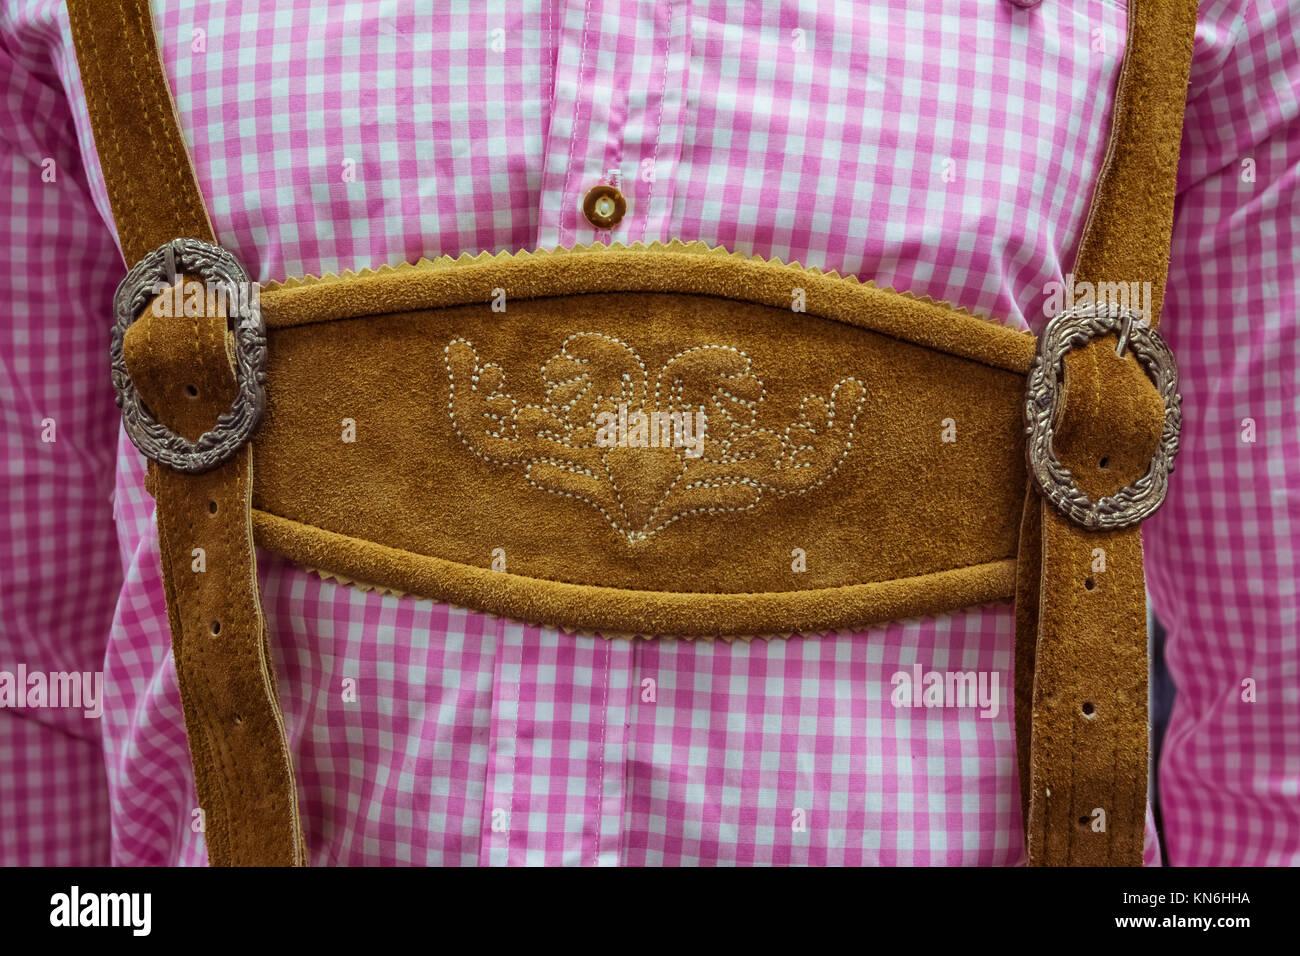 Traditional German Lederhosen Center Chestpiece Closeup Leather Plaid Dress Pink White - Stock Image